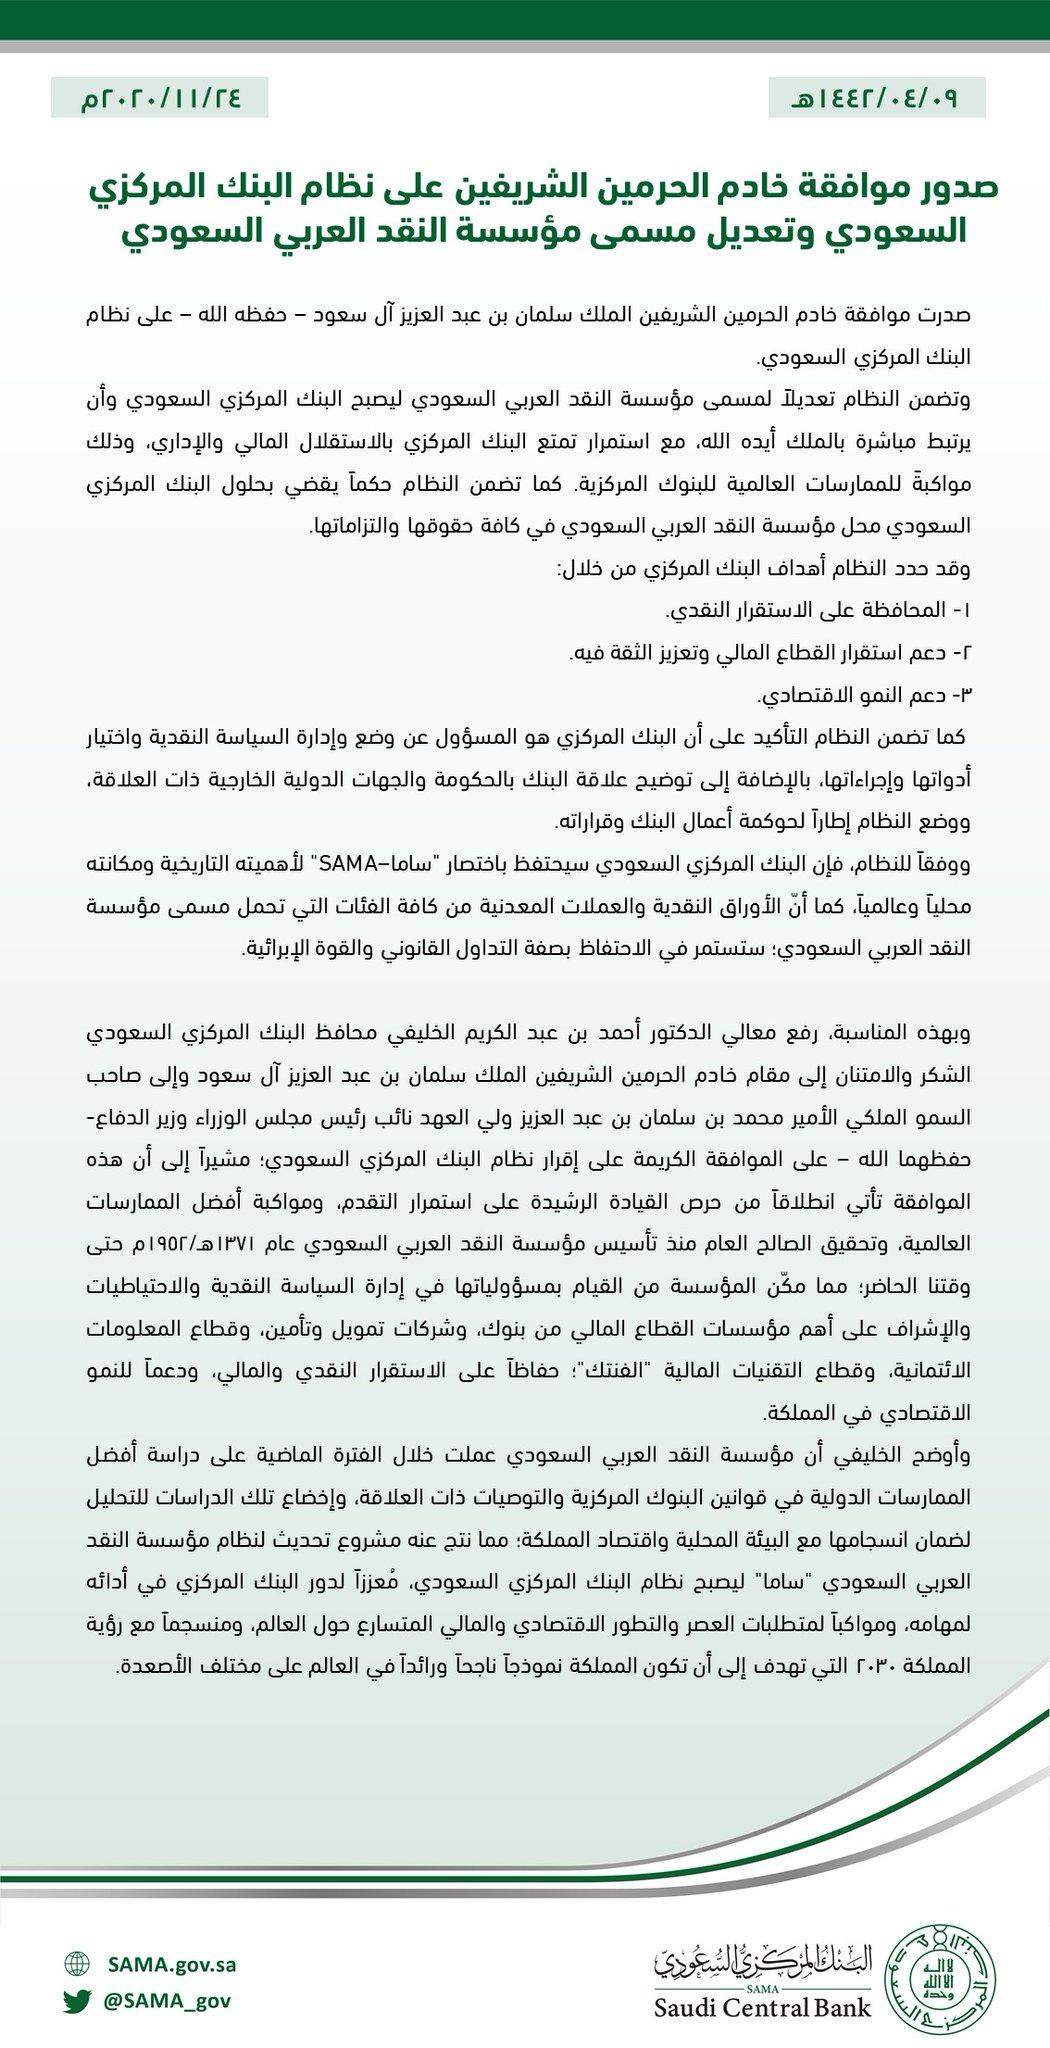 Sama البنك المركزي السعودي On Twitter صدور موافقة خادم الحرمين الشريفين على نظام البنك المركزي السعودي وتعديل مسمى مؤسسة النقد العربي السعودي Https T Co Fq5qzvhdcj Sama Https T Co 5xkkqzchwl